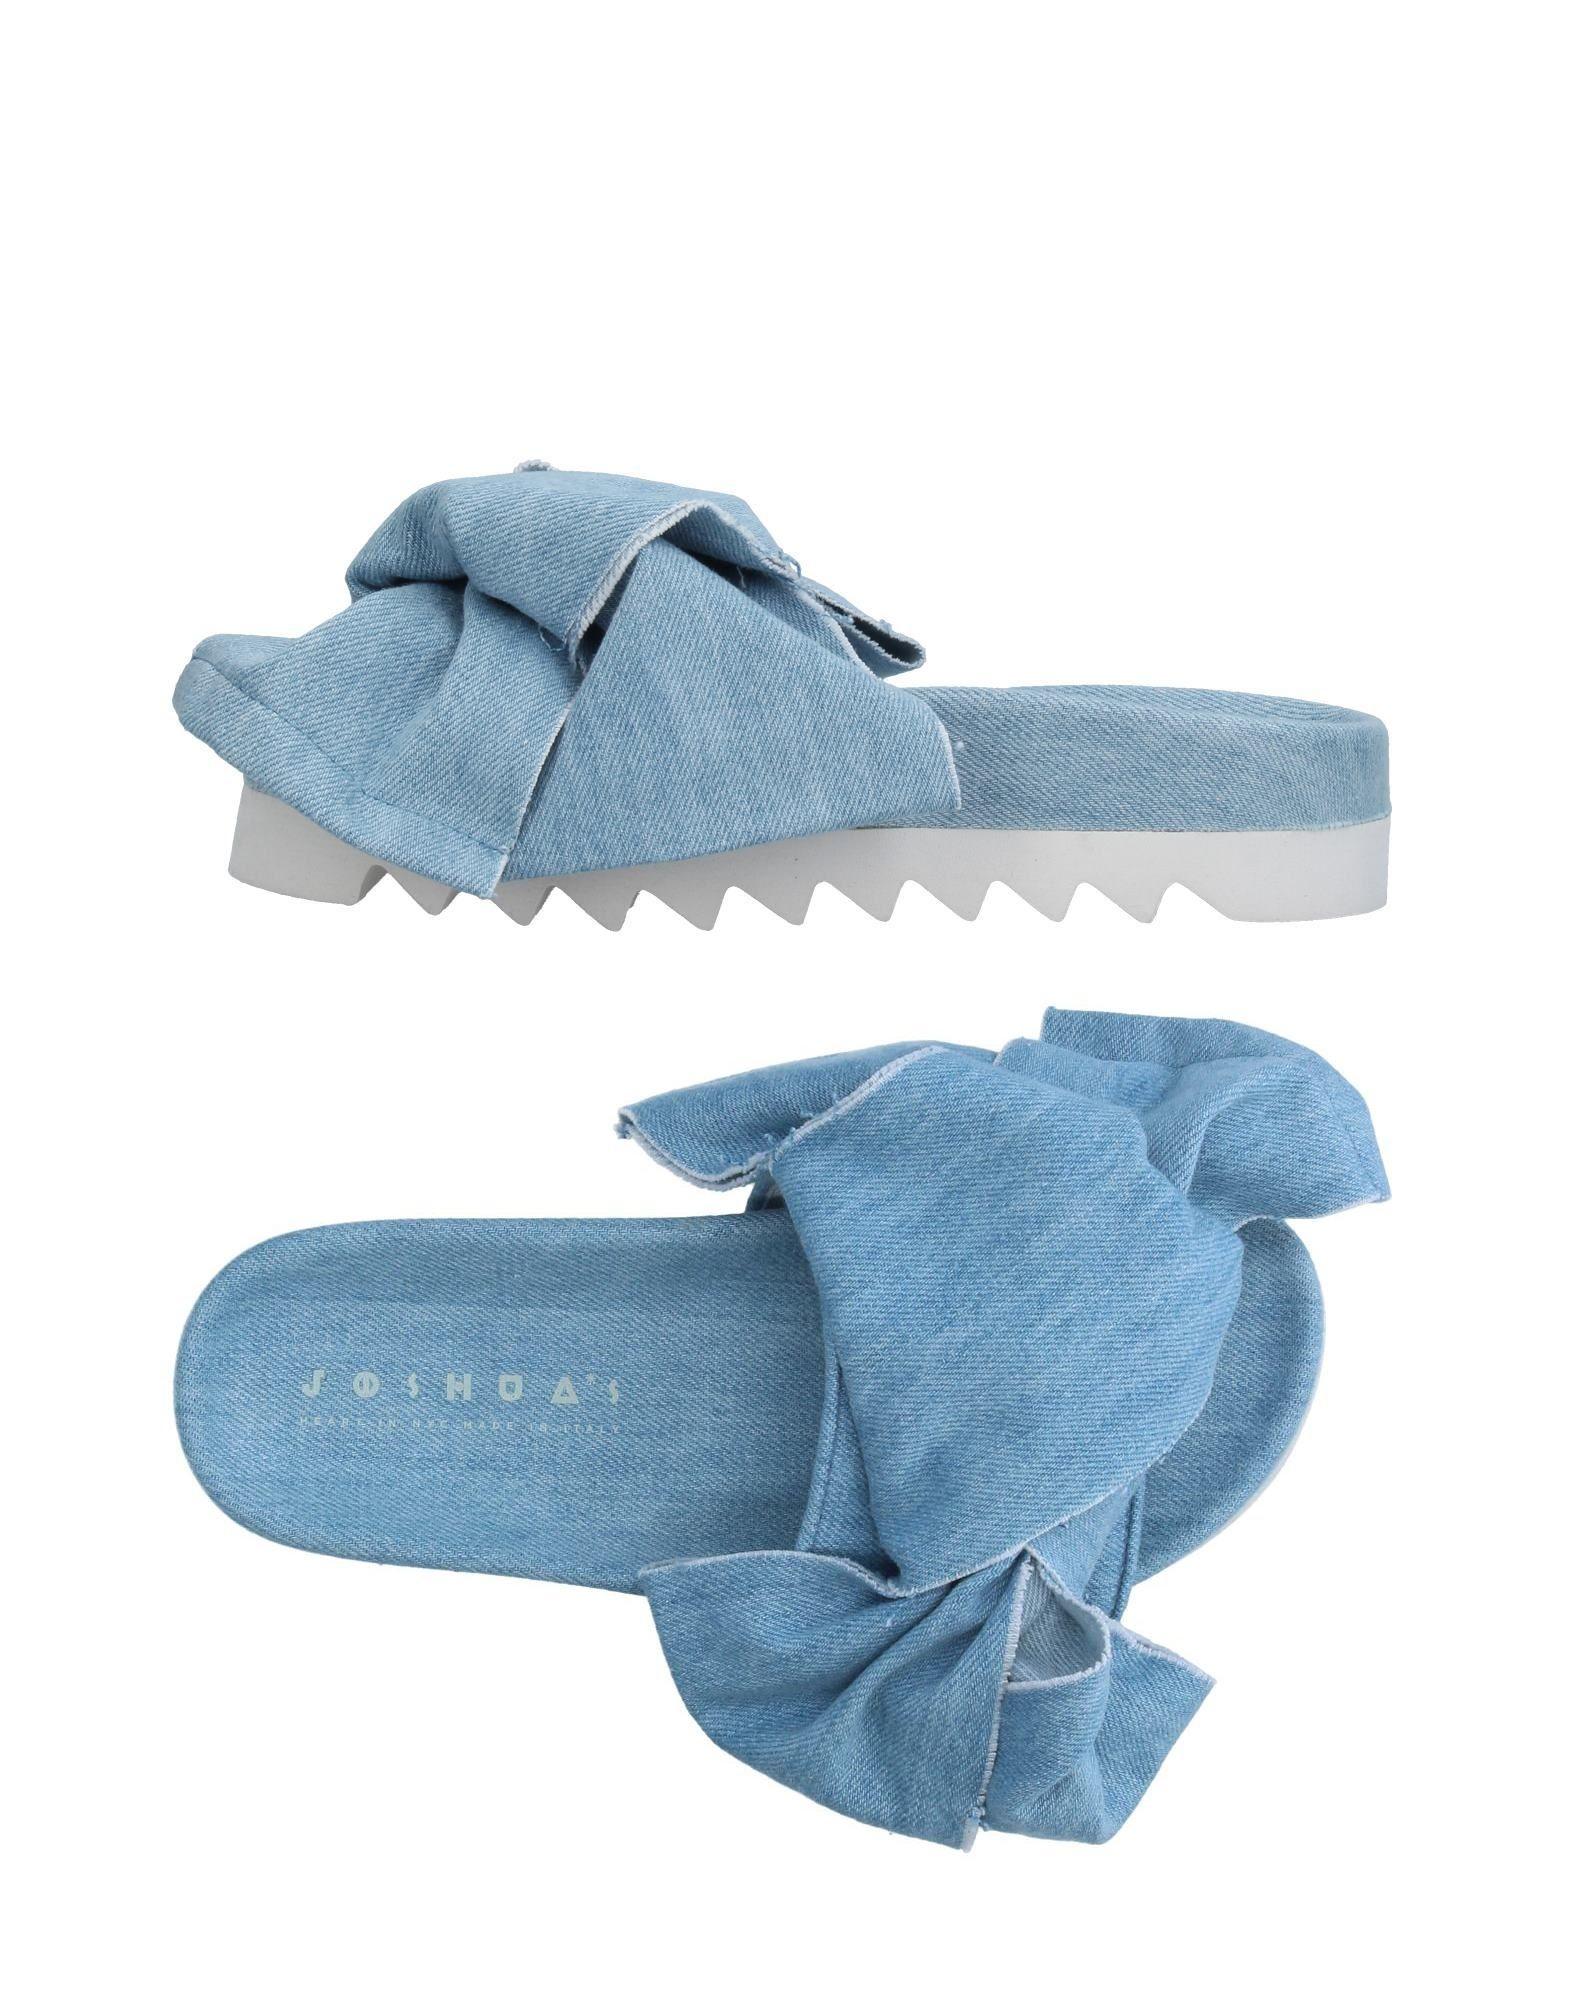 Joshua*S Sandalen Damen  11337648TKGut aussehende strapazierfähige Schuhe